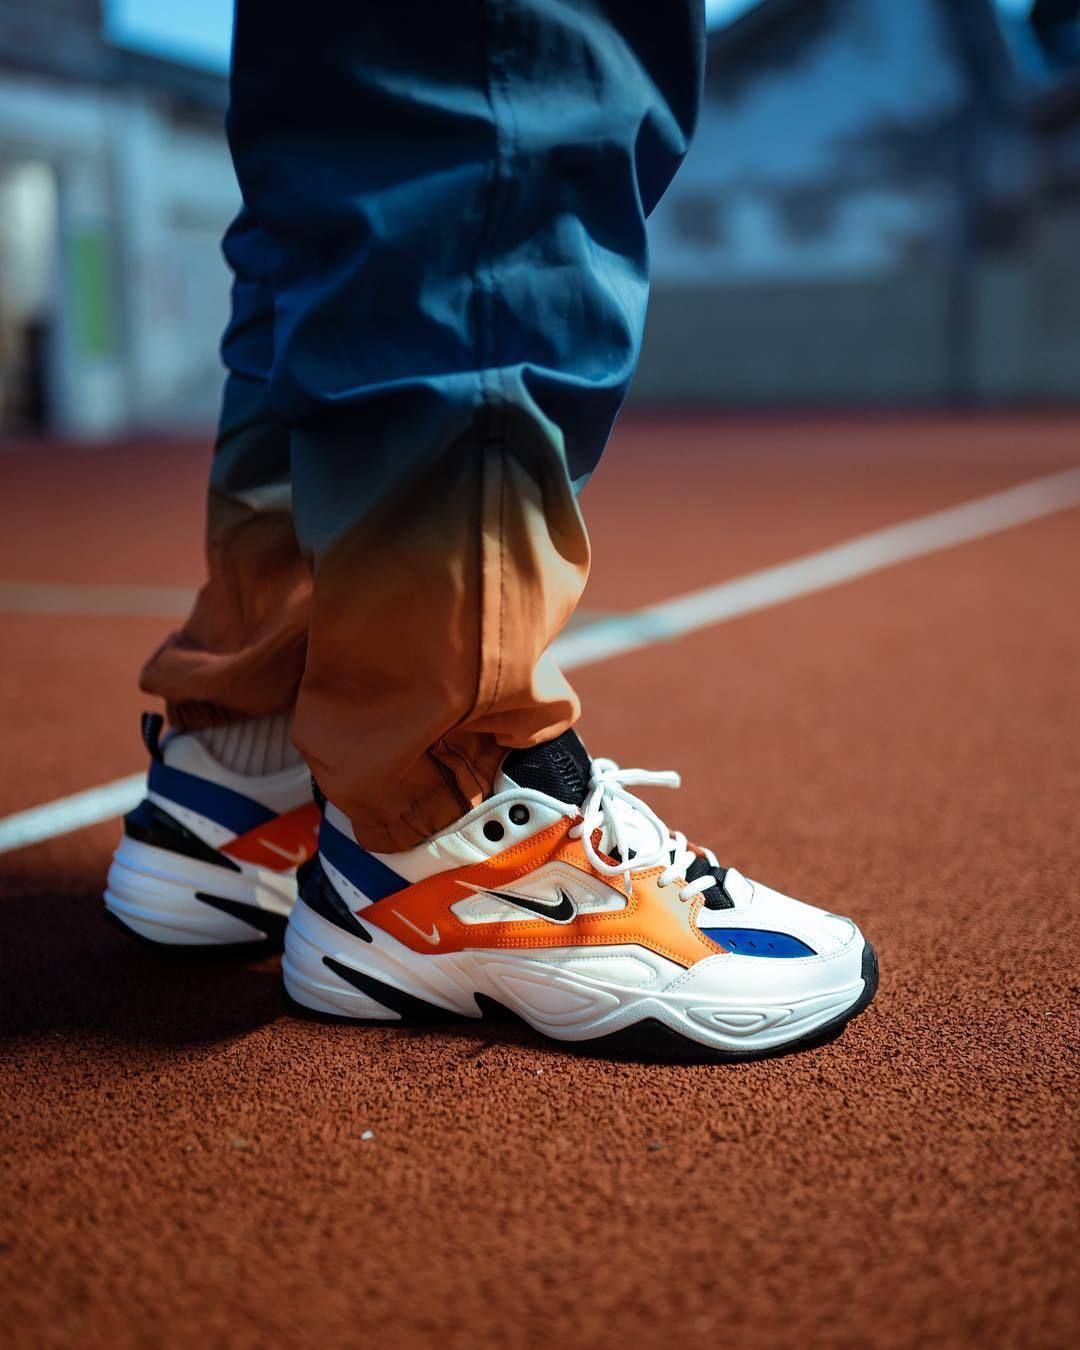 new concept 29adf 5802e Block Street Look, Street Wear, Unisex Fashion, Apparel Design, Sports Shoes ,